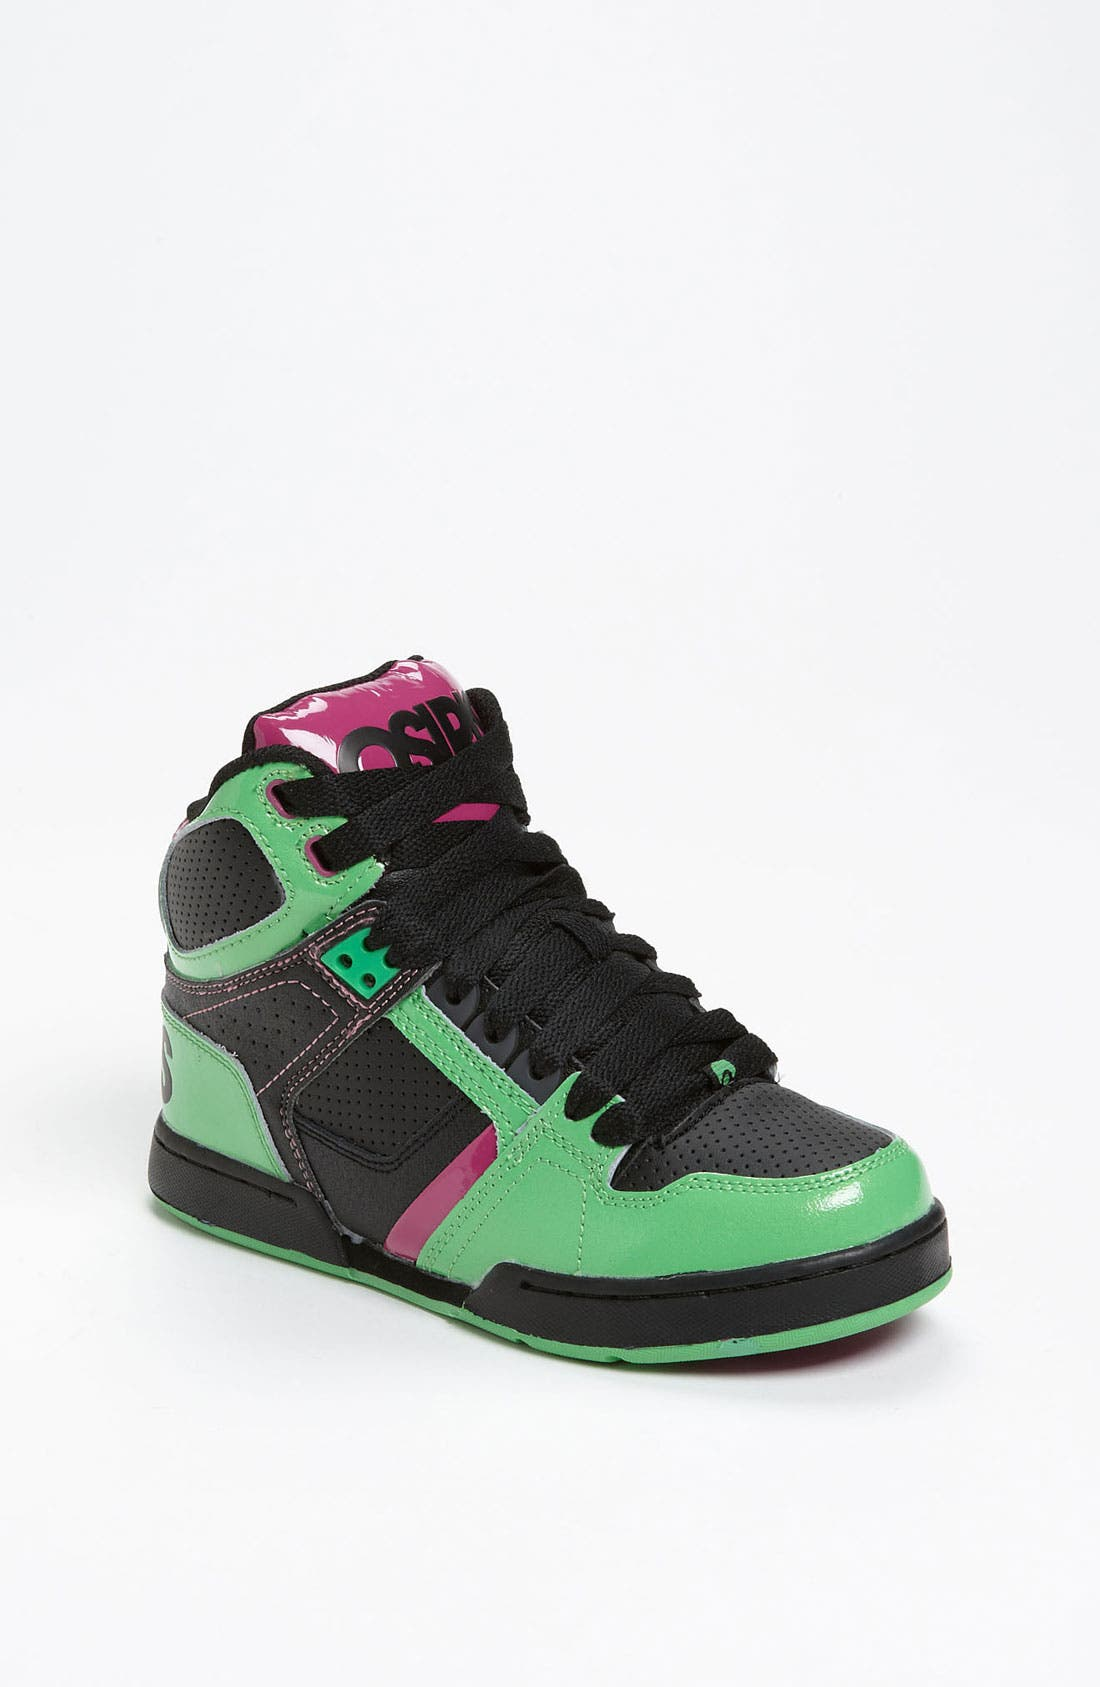 Main Image - Osiris 'NYC 83' Skate Shoe (Big Kid)